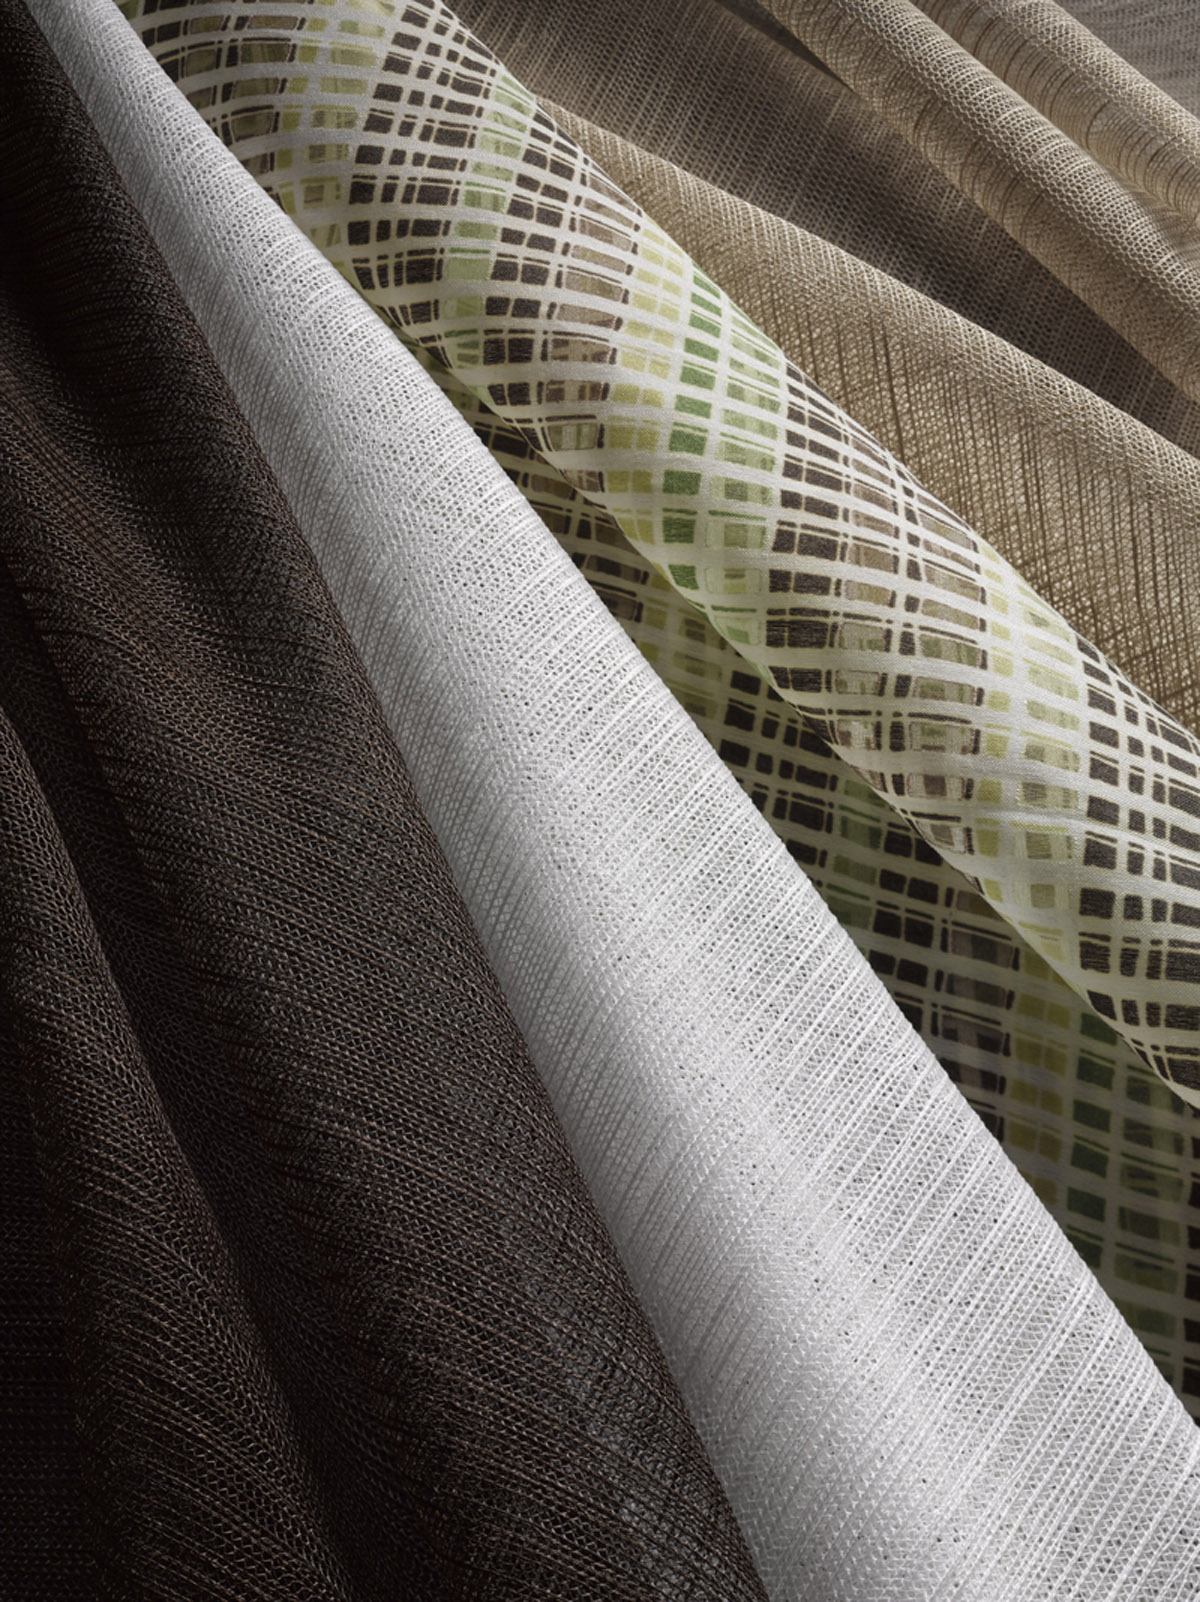 gramet drapes window louver img silk drape shades box roller cornice roman vertical blinds